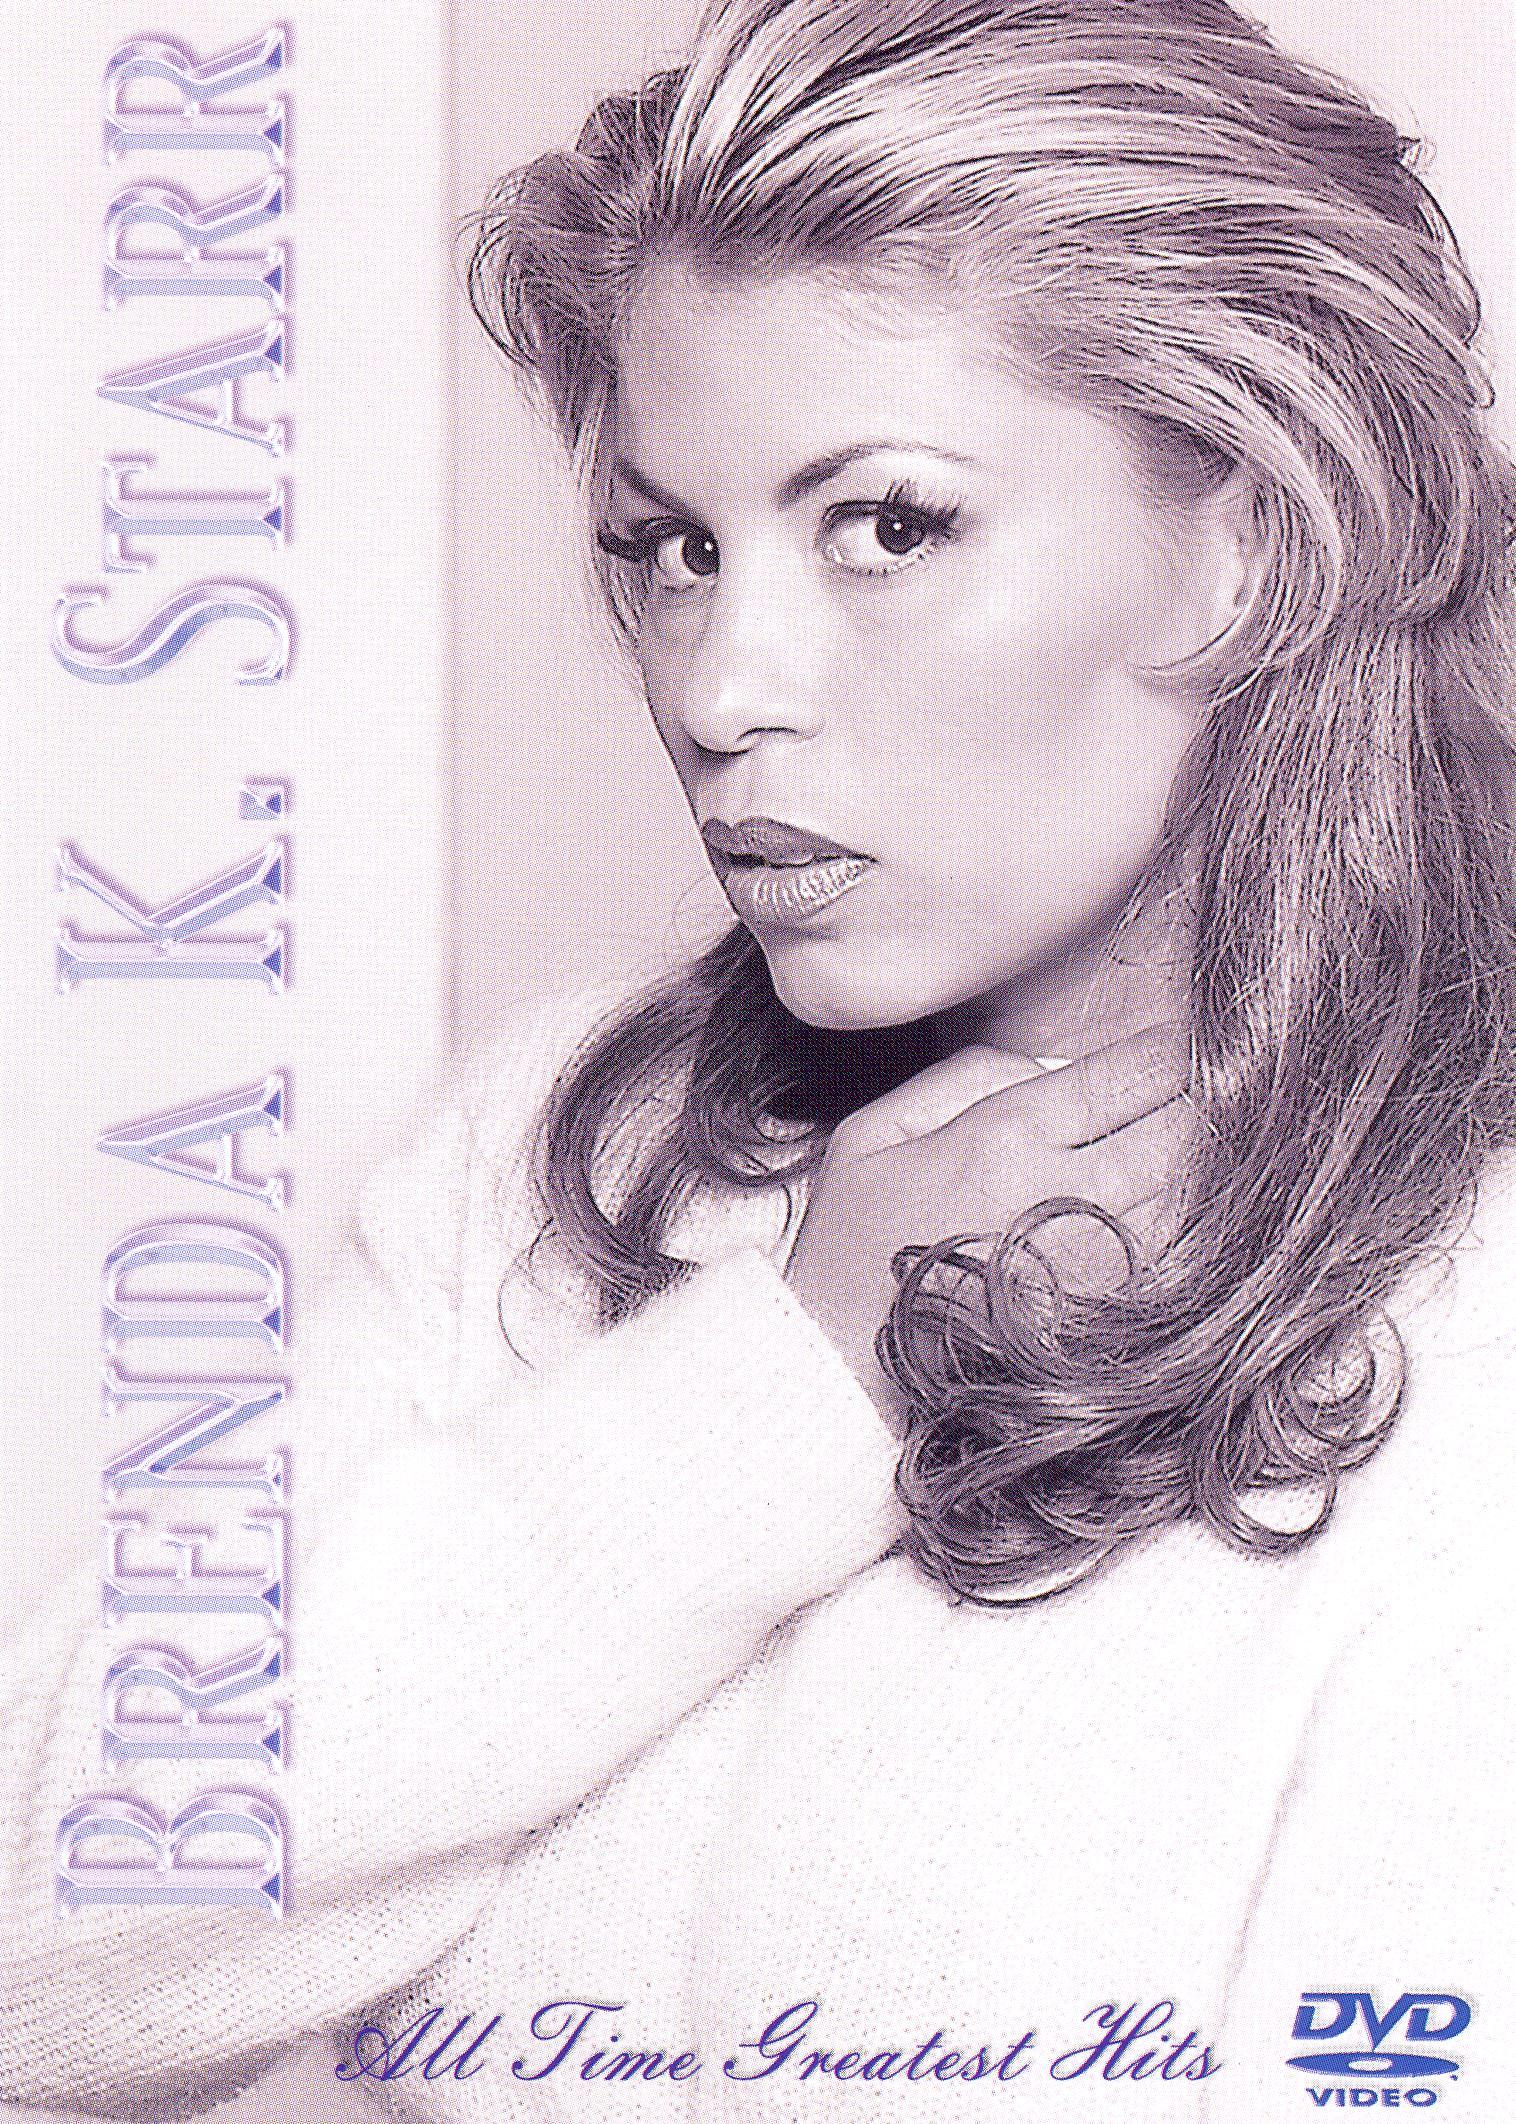 Brenda K. Starr: All Time Greatest Hits